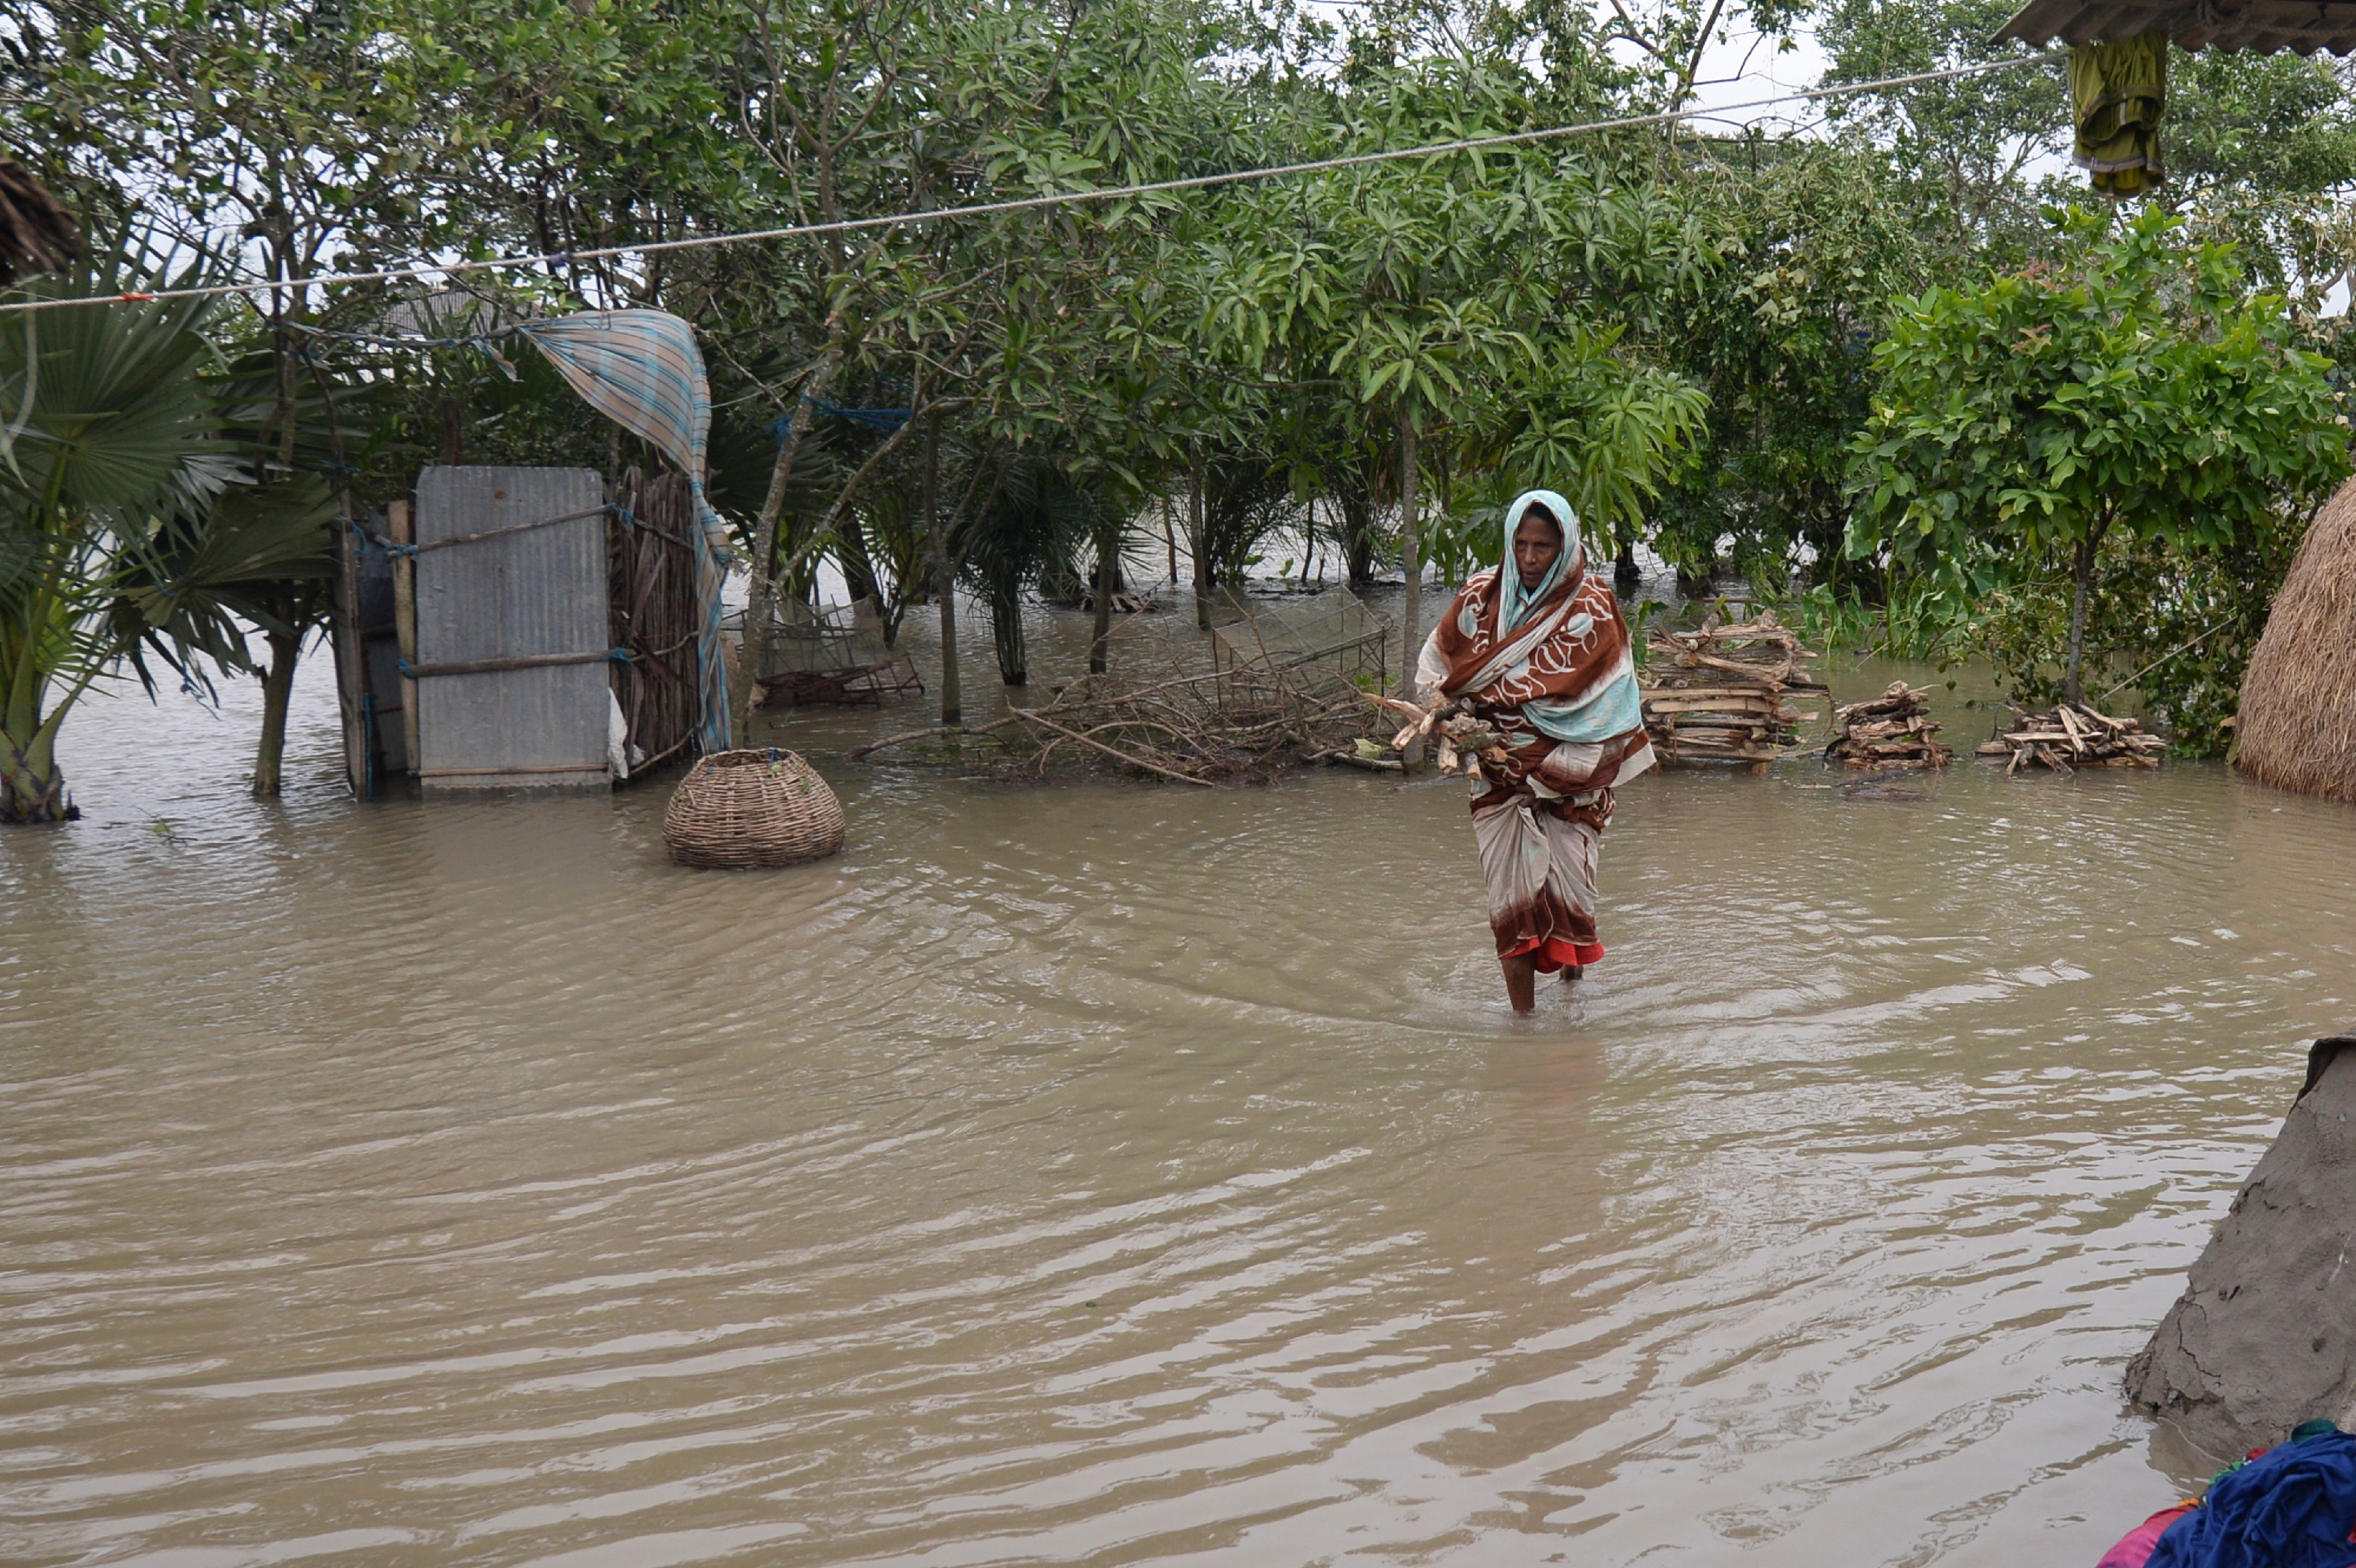 India's cyclone season starts in two weeks. (Photo by MUNIR UZ ZAMAN/AFP via Getty Images)